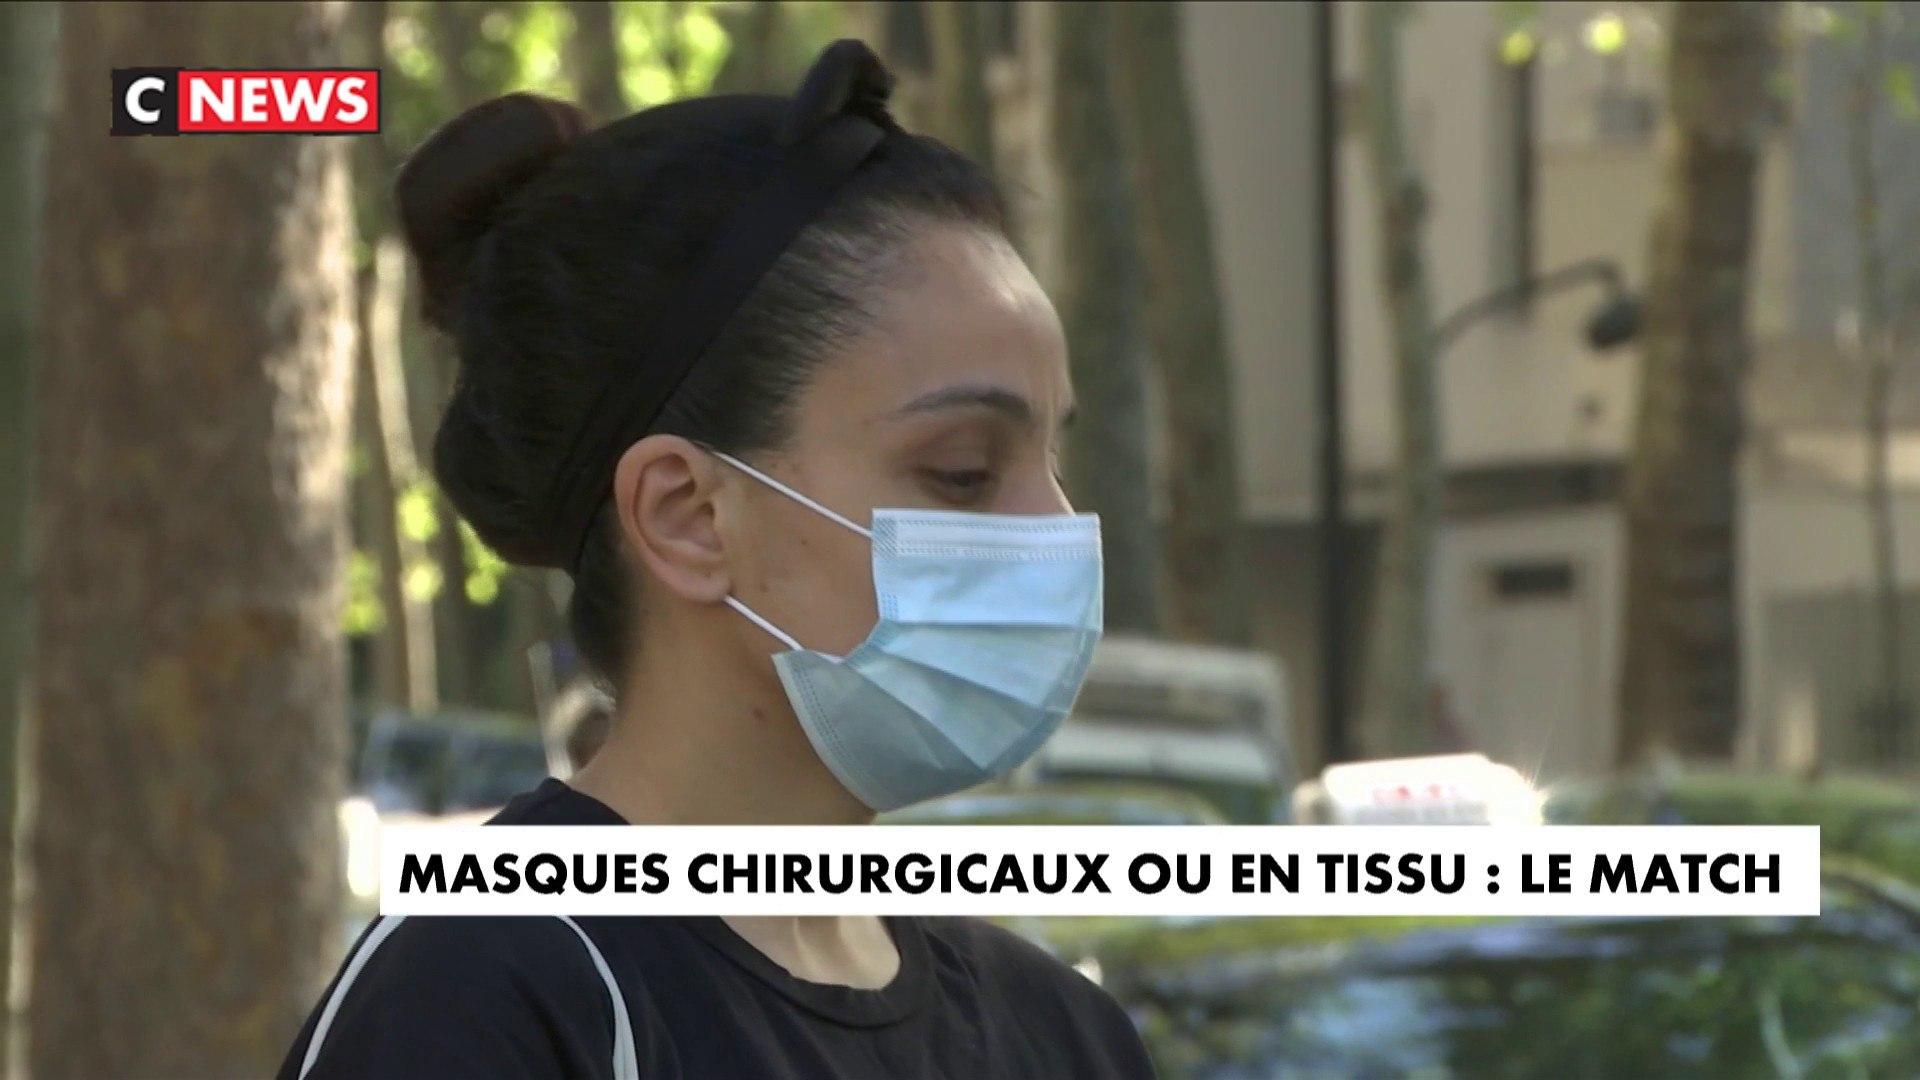 Masque chirurgical ou en tissu : lequel choisir en période de canicule ?